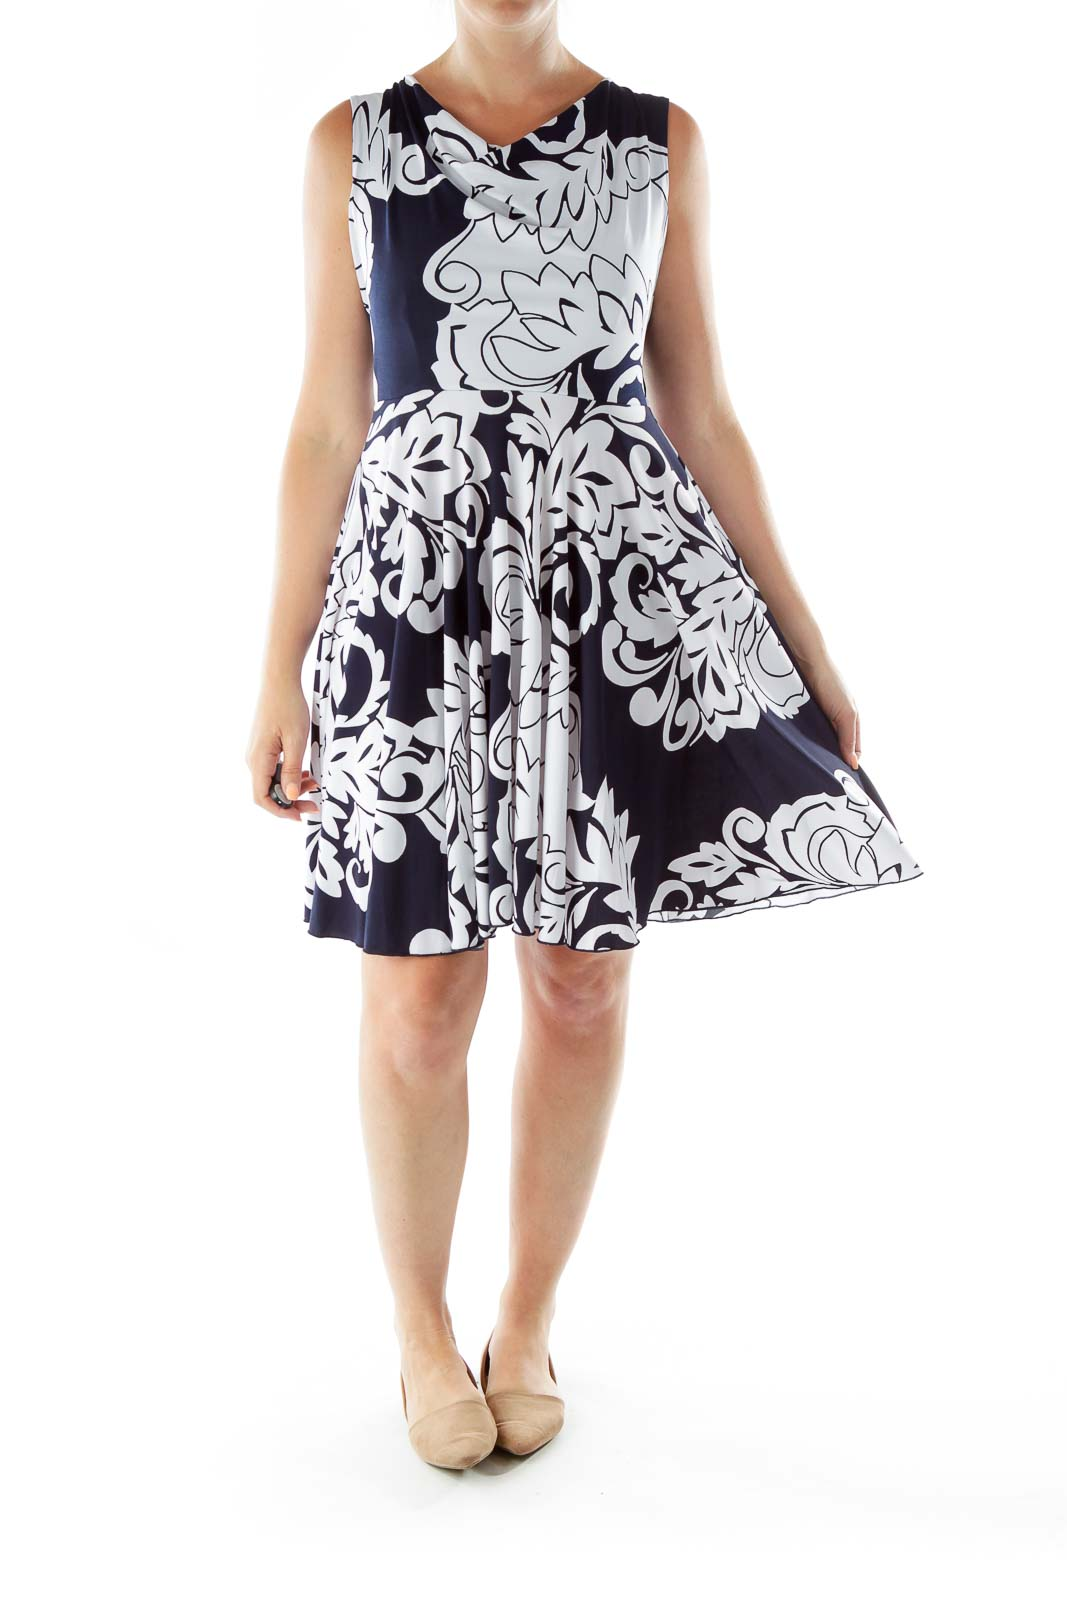 Navy White Print Sleeveless Day Dress